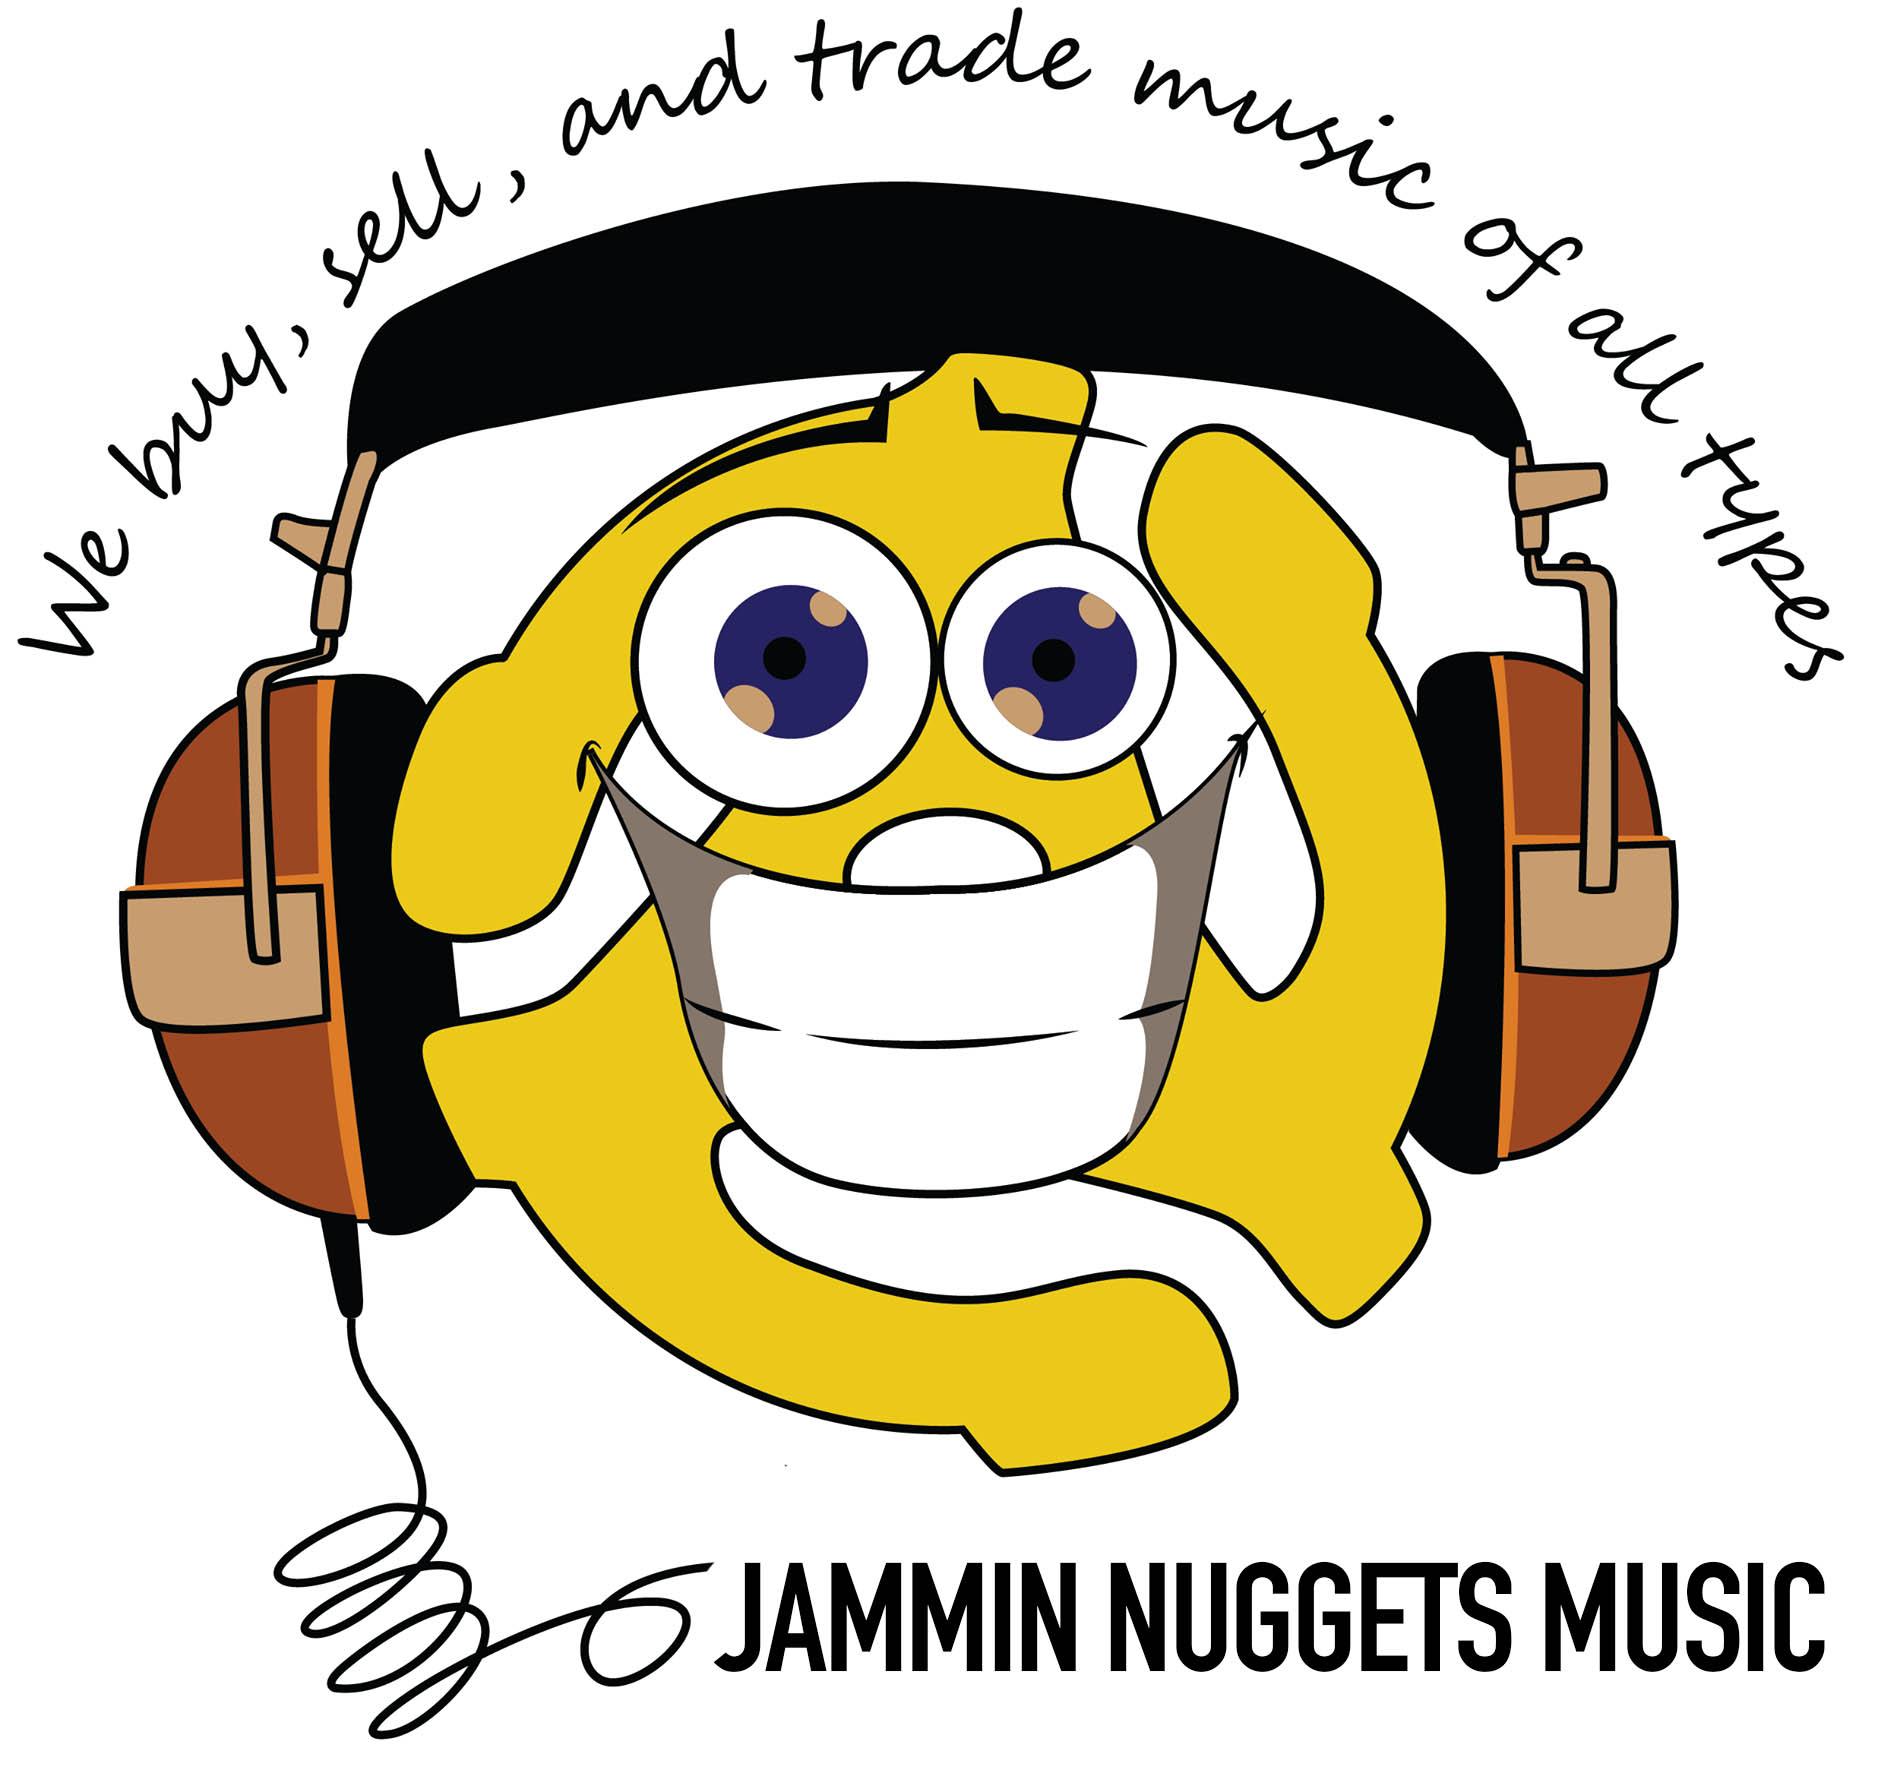 jamminnuggetsmusic